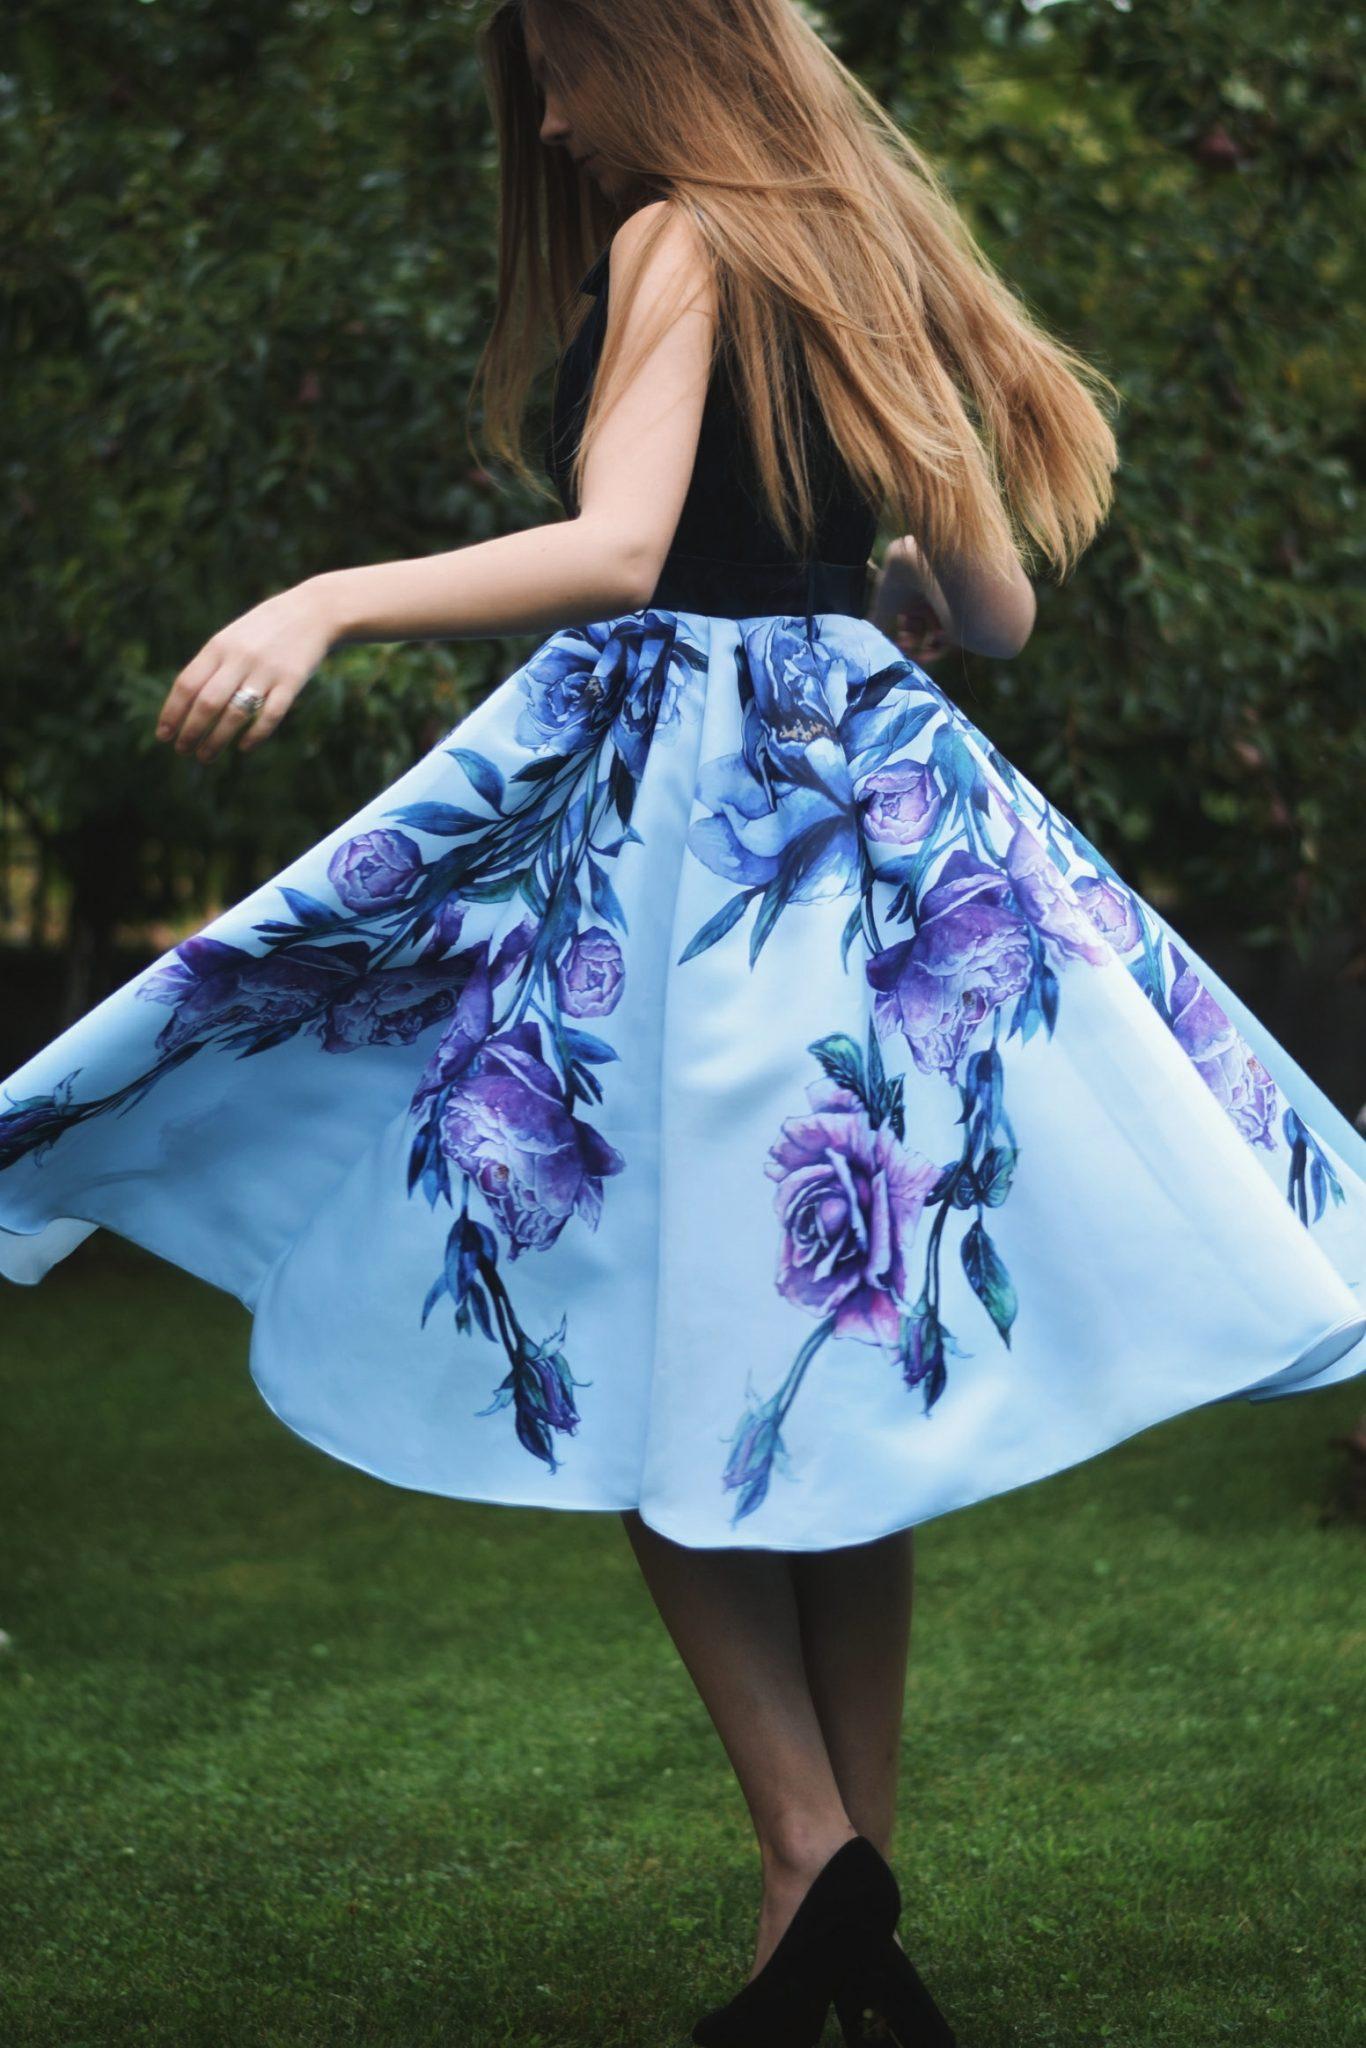 Rochia de zi cu imprimeu Blue Bouquet | Sinestezic | #SinestezicQueens | Ingrid Orosz